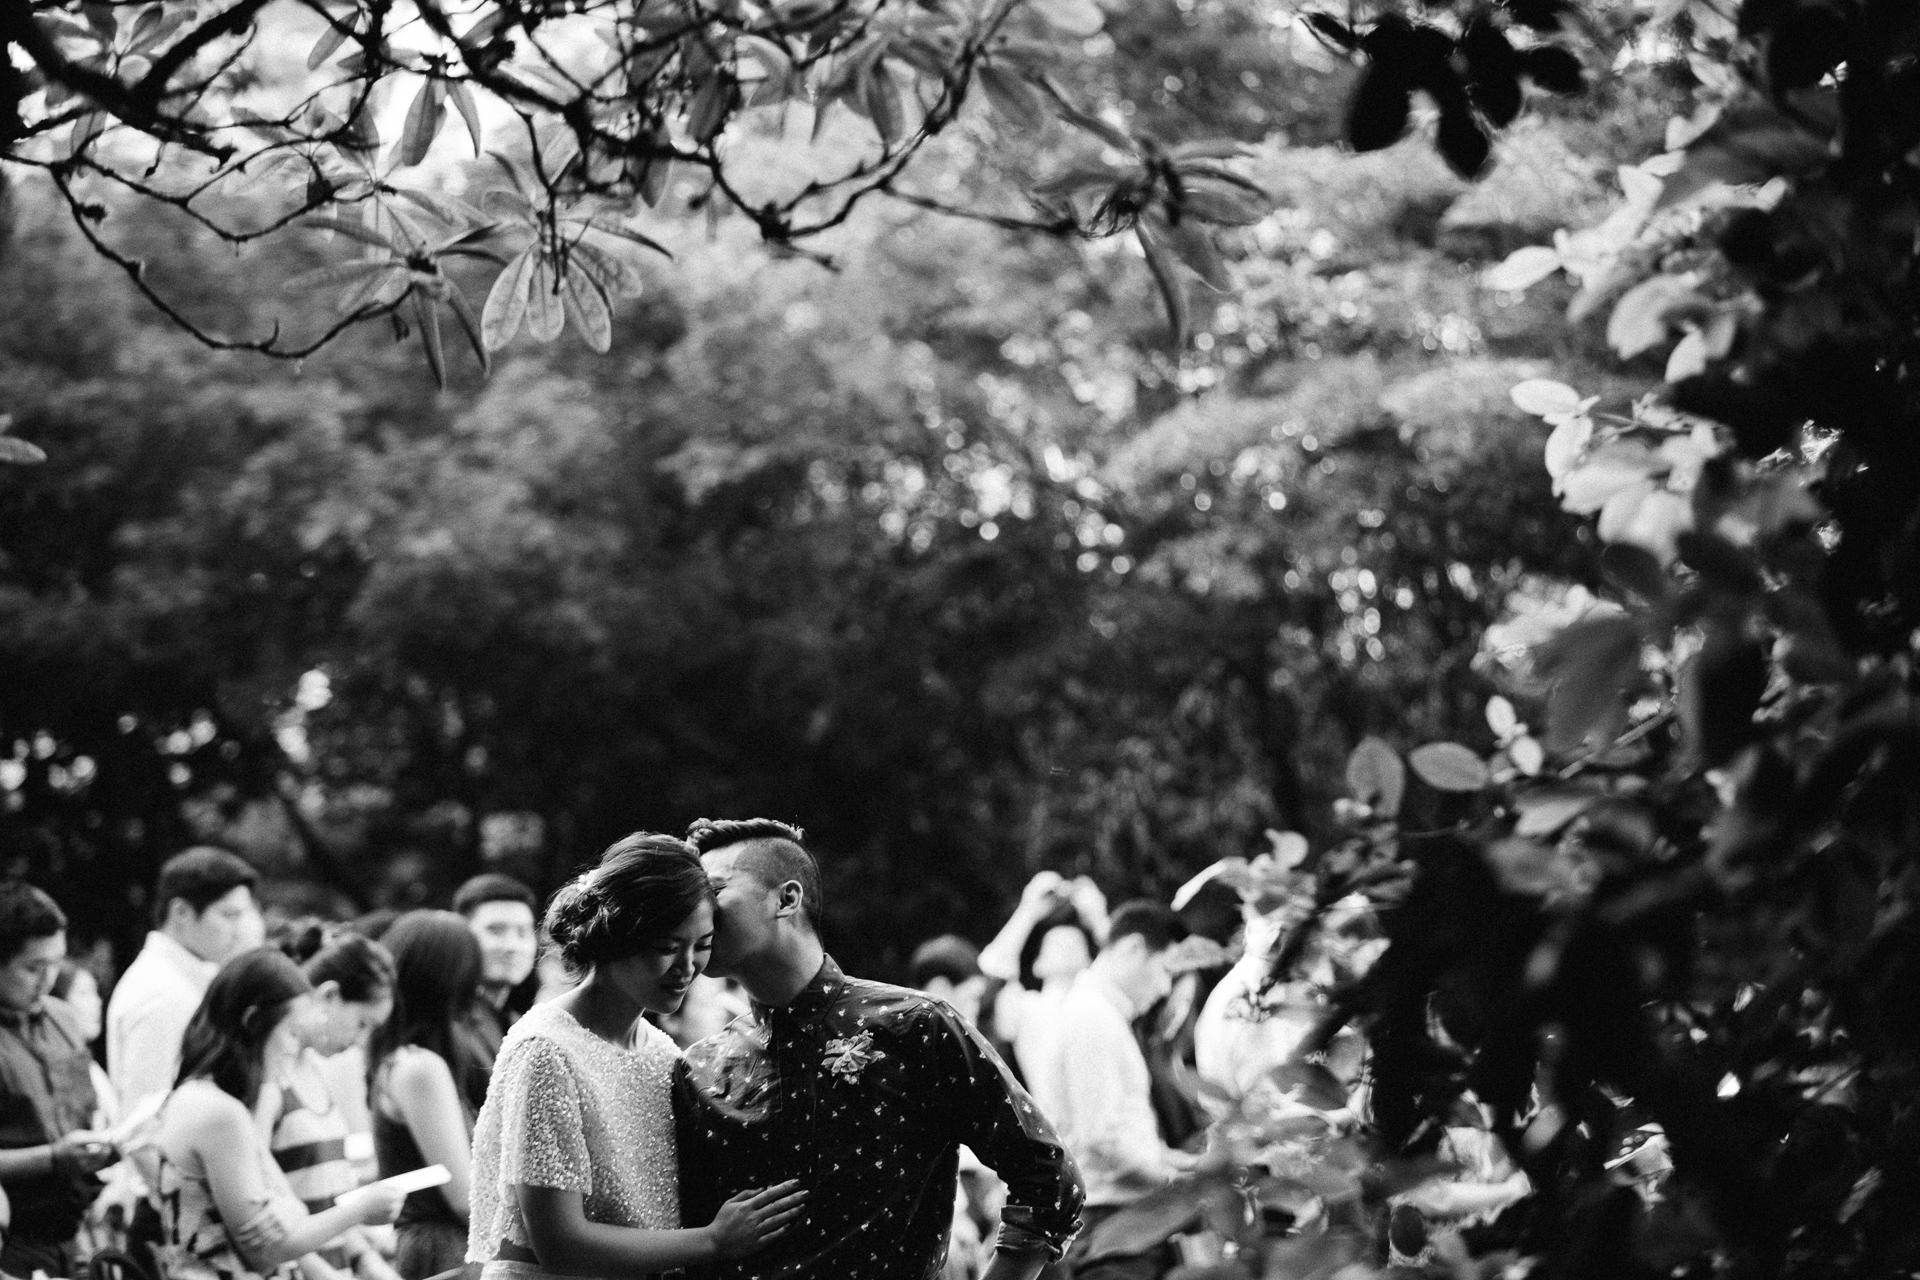 jess-hunter-seattle-artistic-wedding-photographer-5097.jpg